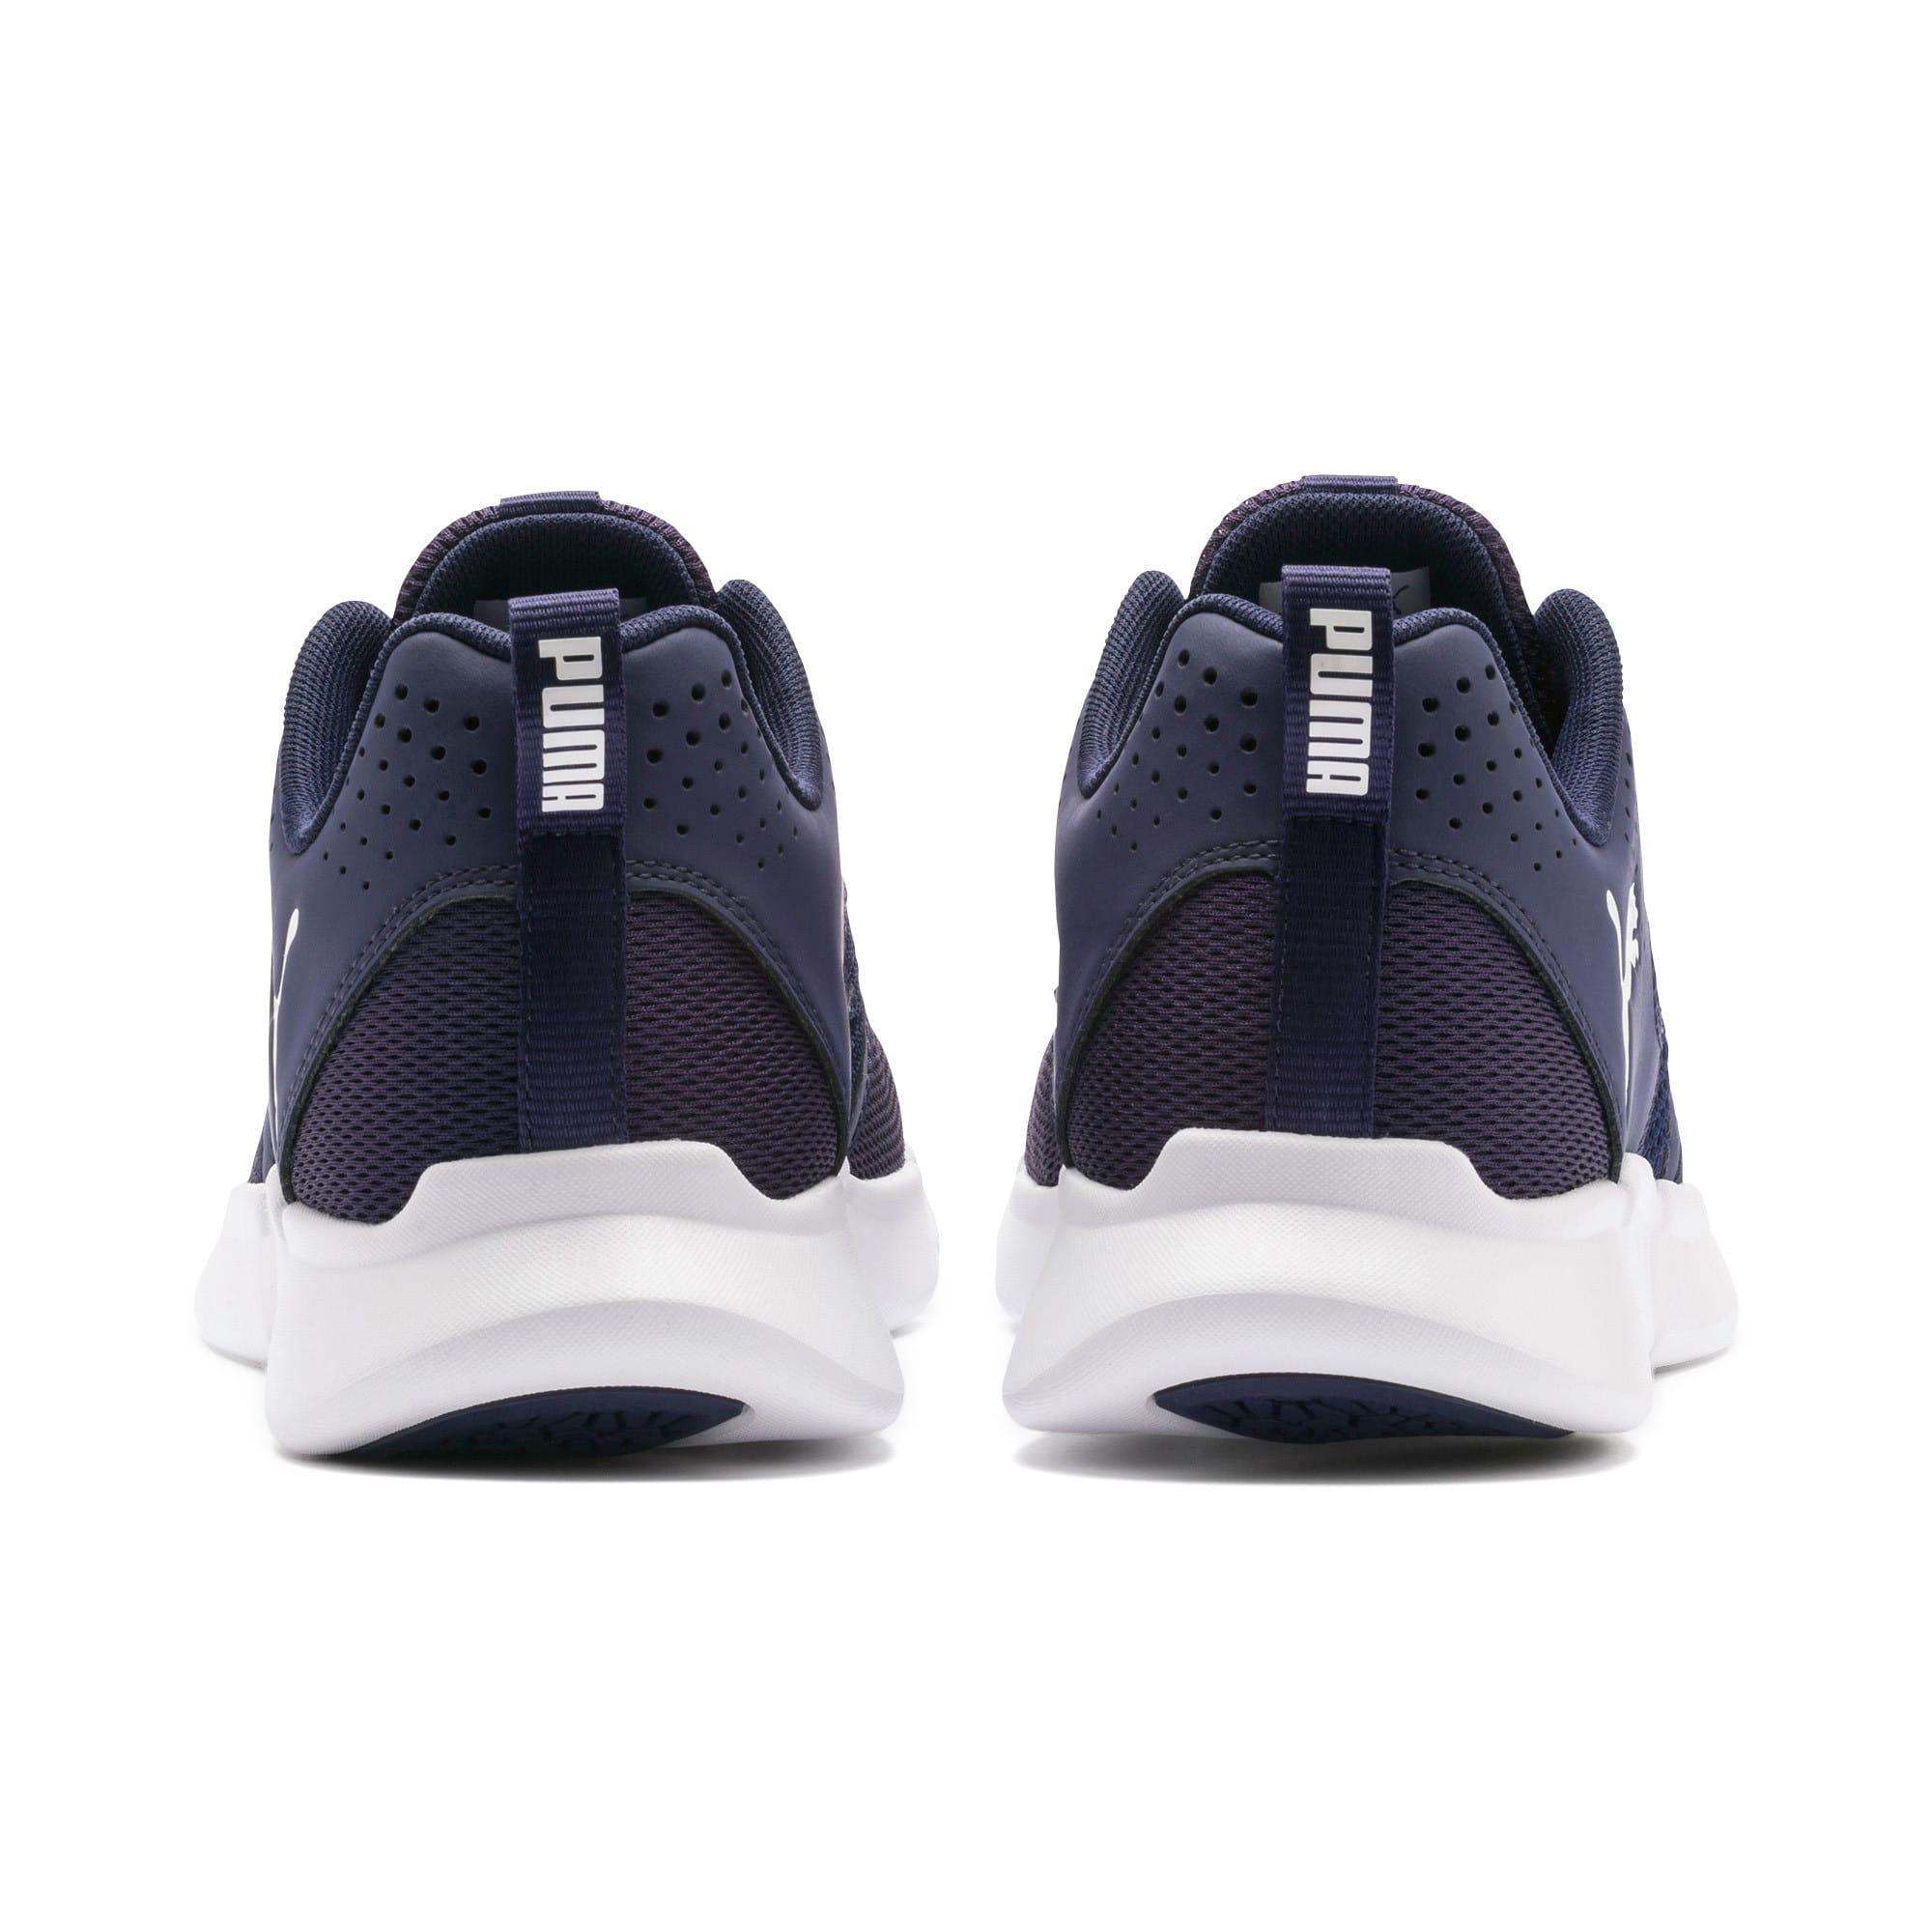 Thumbnail 5 of INTERFLEX Modern Running Shoes, Peacoat-Puma White, medium-IND